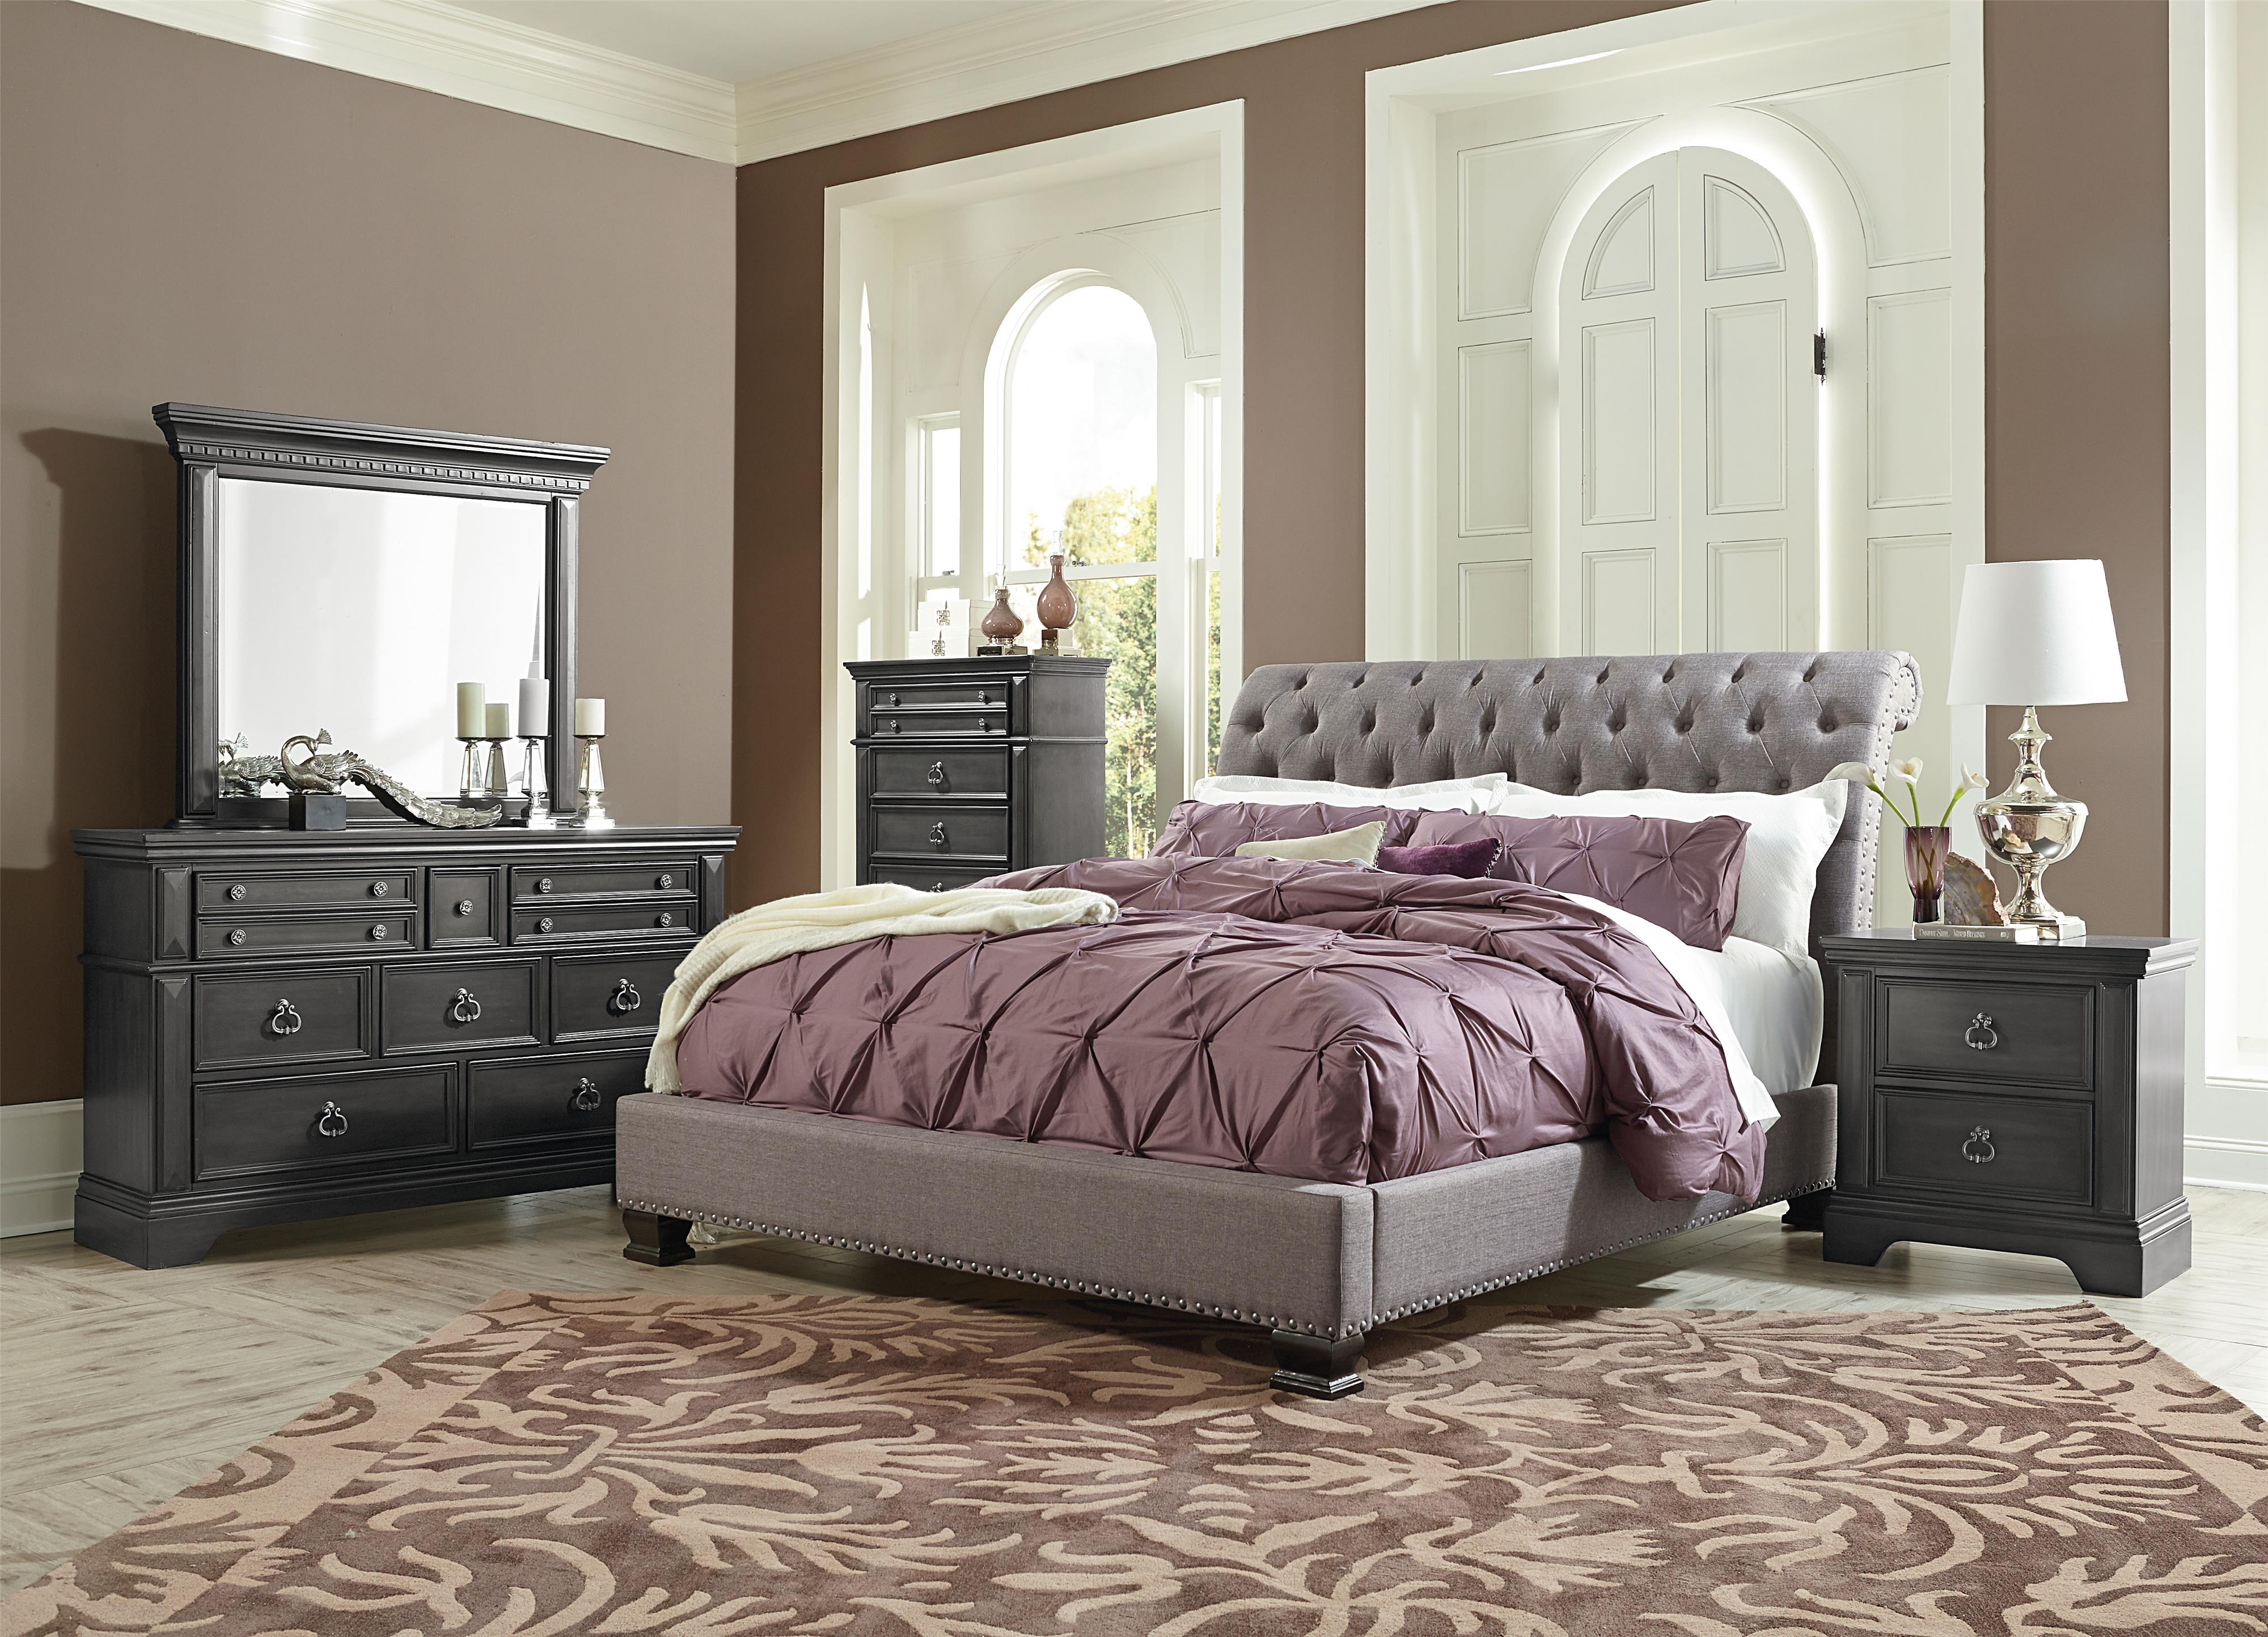 Standard Furniture Garrison Queen Bedroom Group   Item Number: 86300 Q  Bedroom Group 3